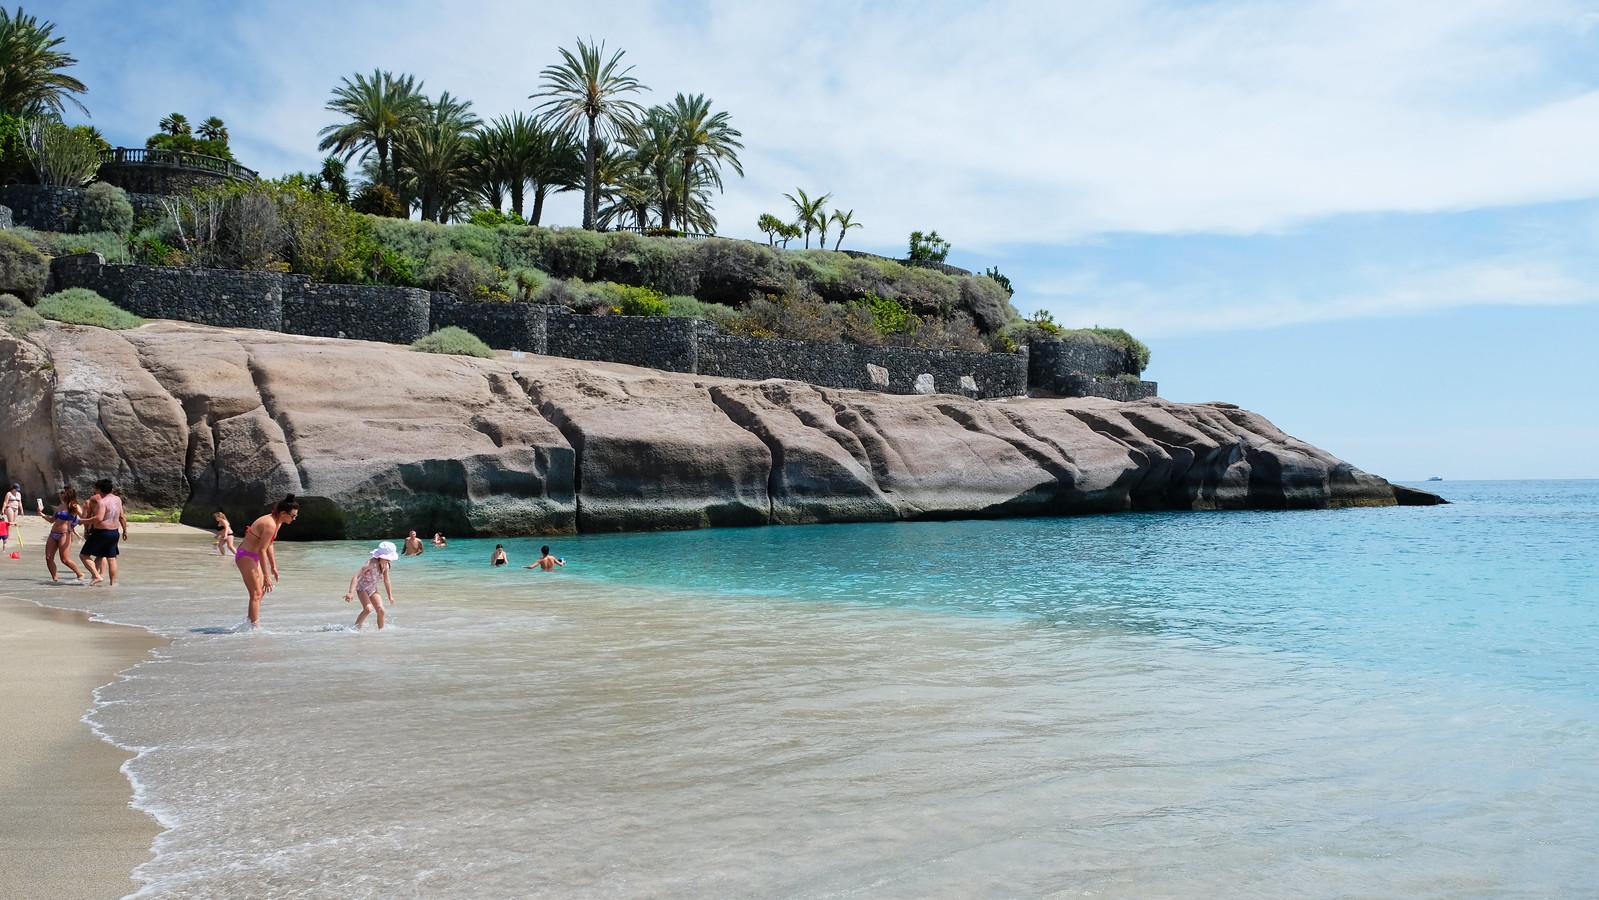 El Duque Beach, Tenerife, Canary Islands, Spain